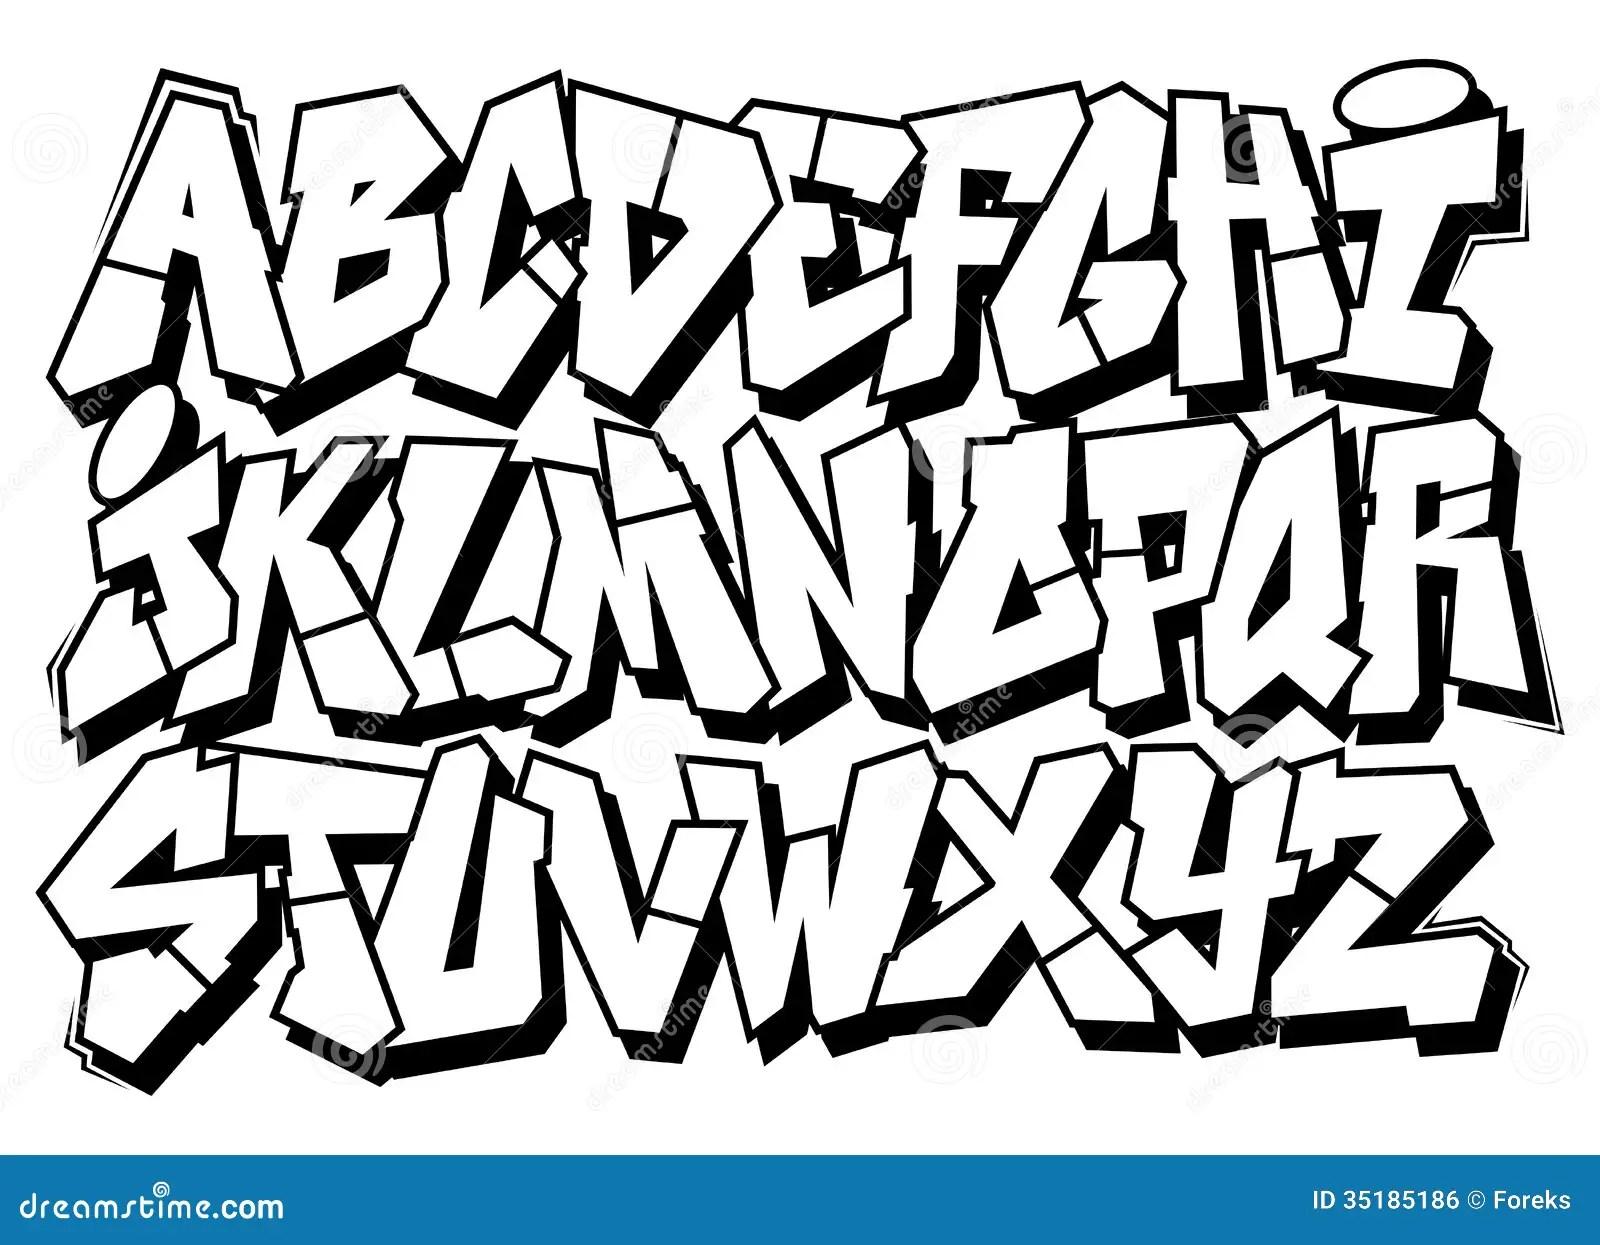 Classic Street Art Graffiti Font Type Alphabet Royalty